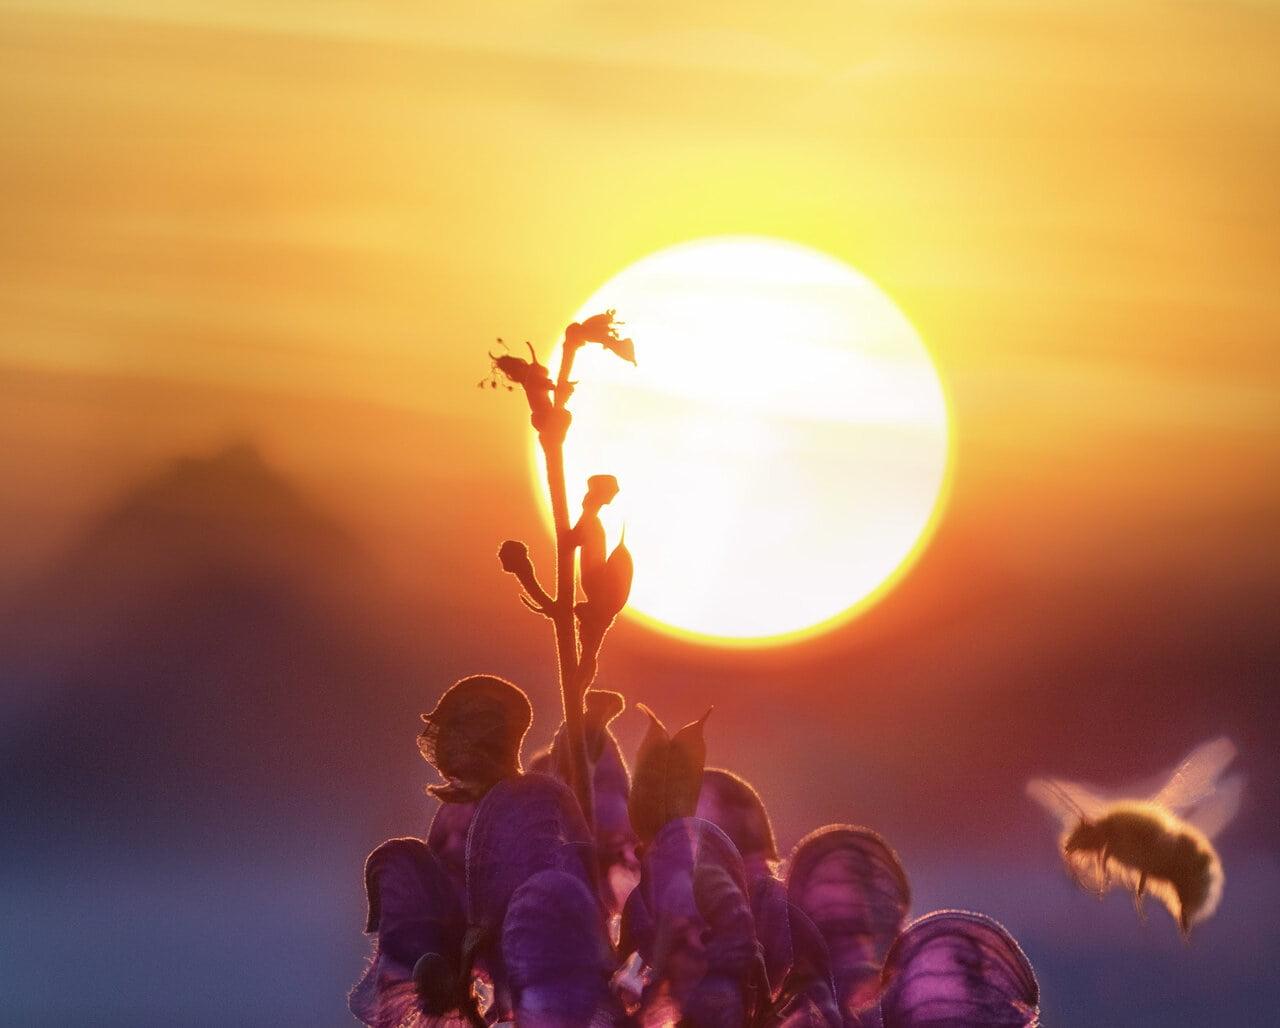 Image of a bright sun symbolic of ego death